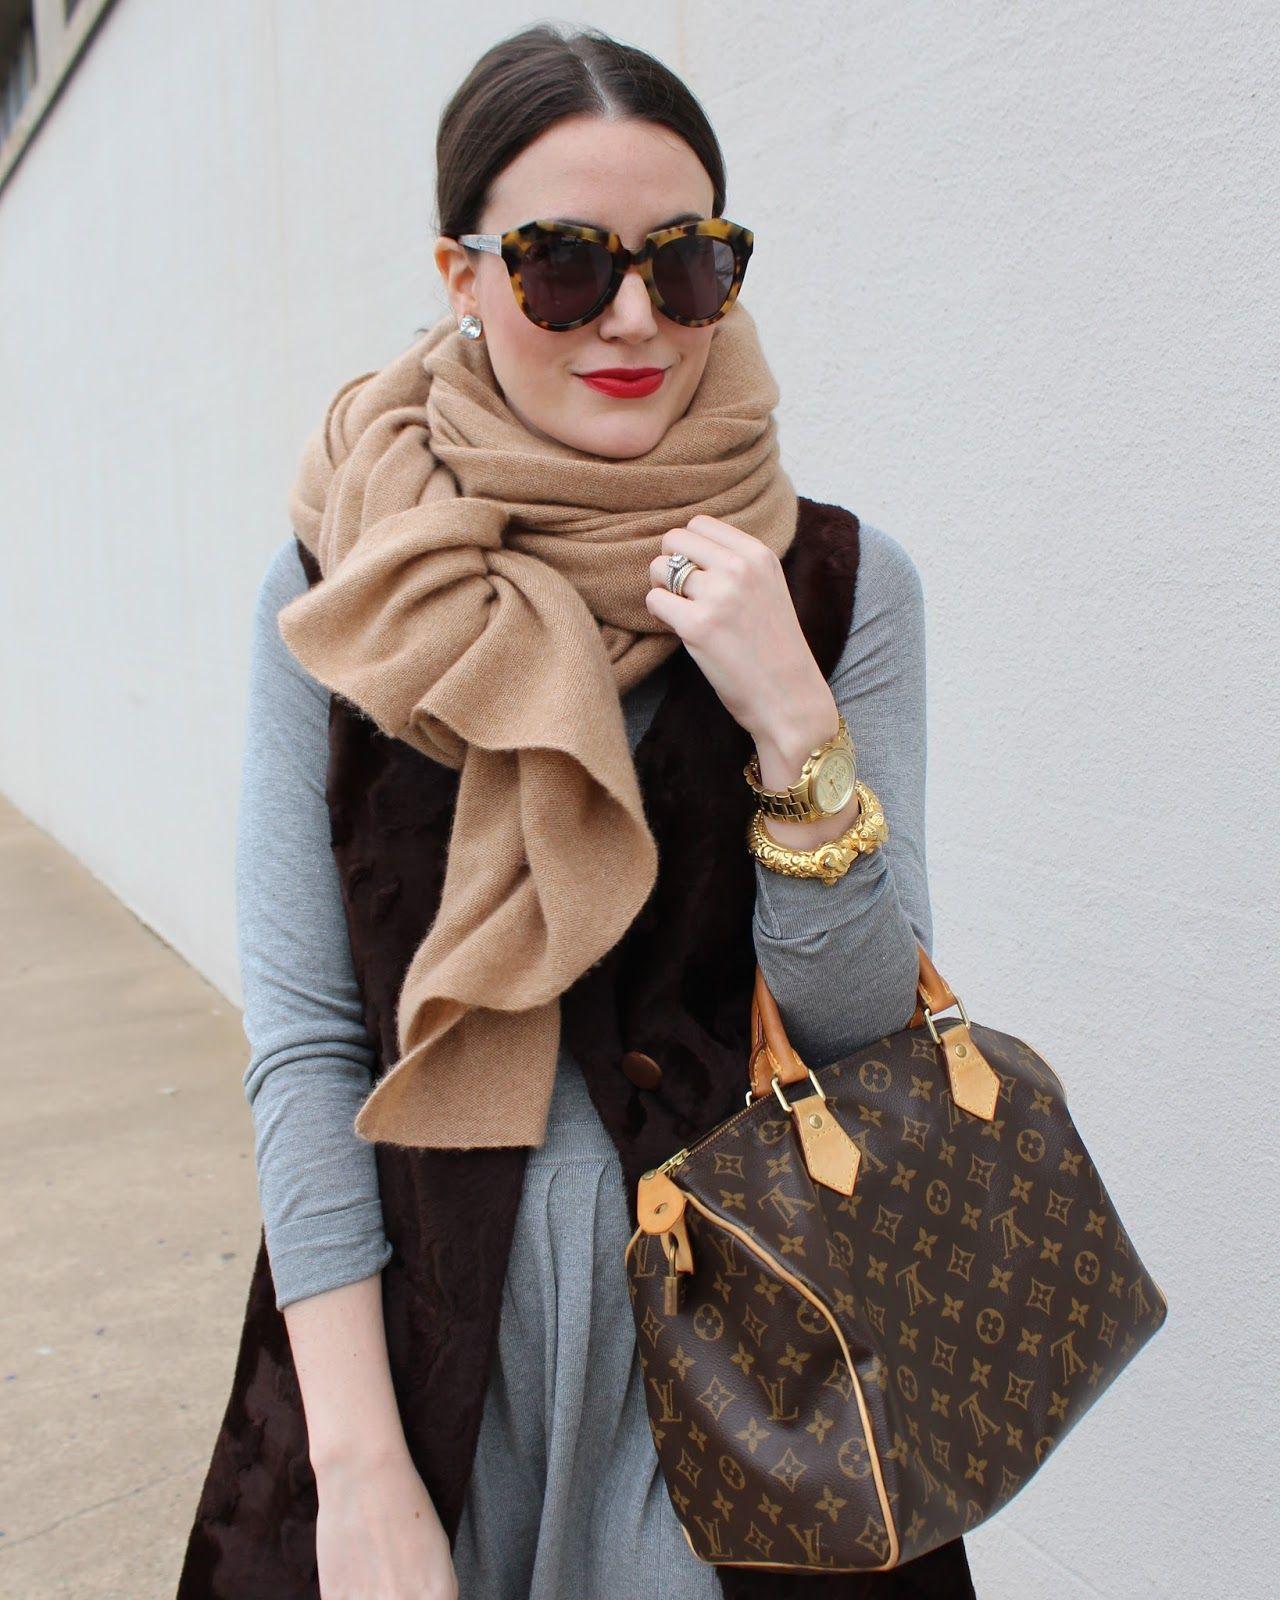 25 30 Www Bing Comhella O: Louis Vuitton Handbags